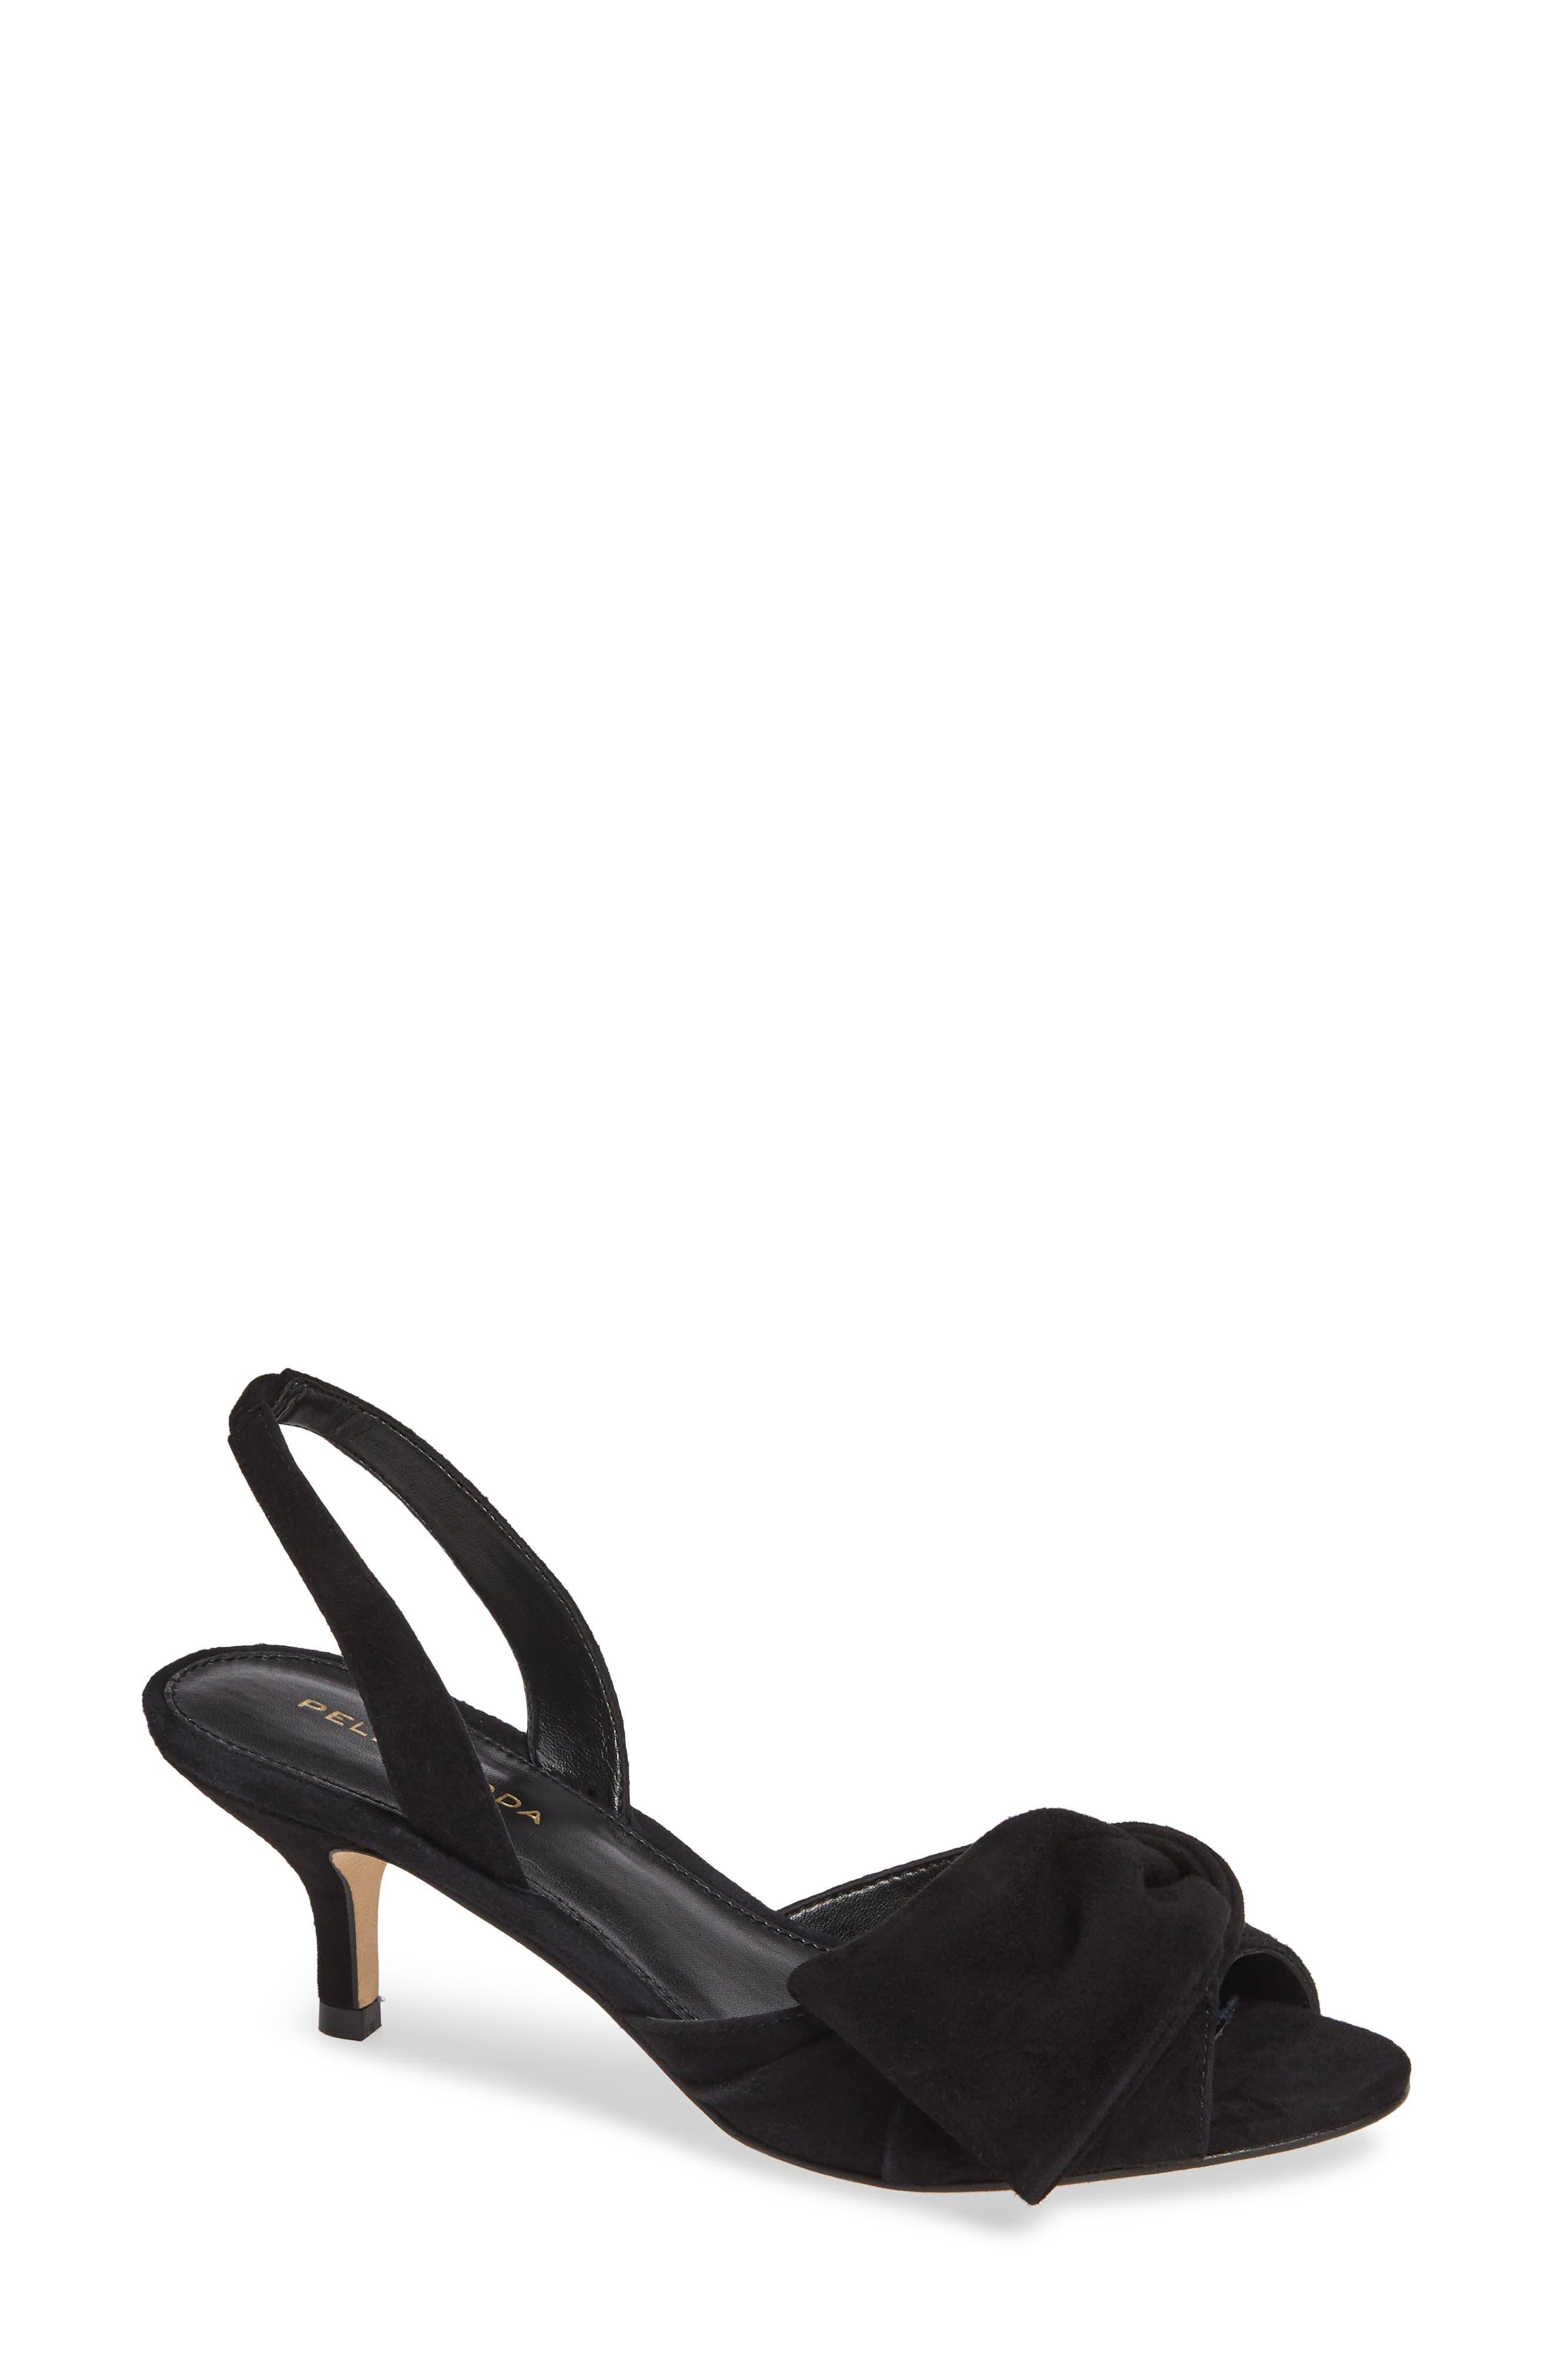 Lovi Sandal,                         Main,                         color, BLACK